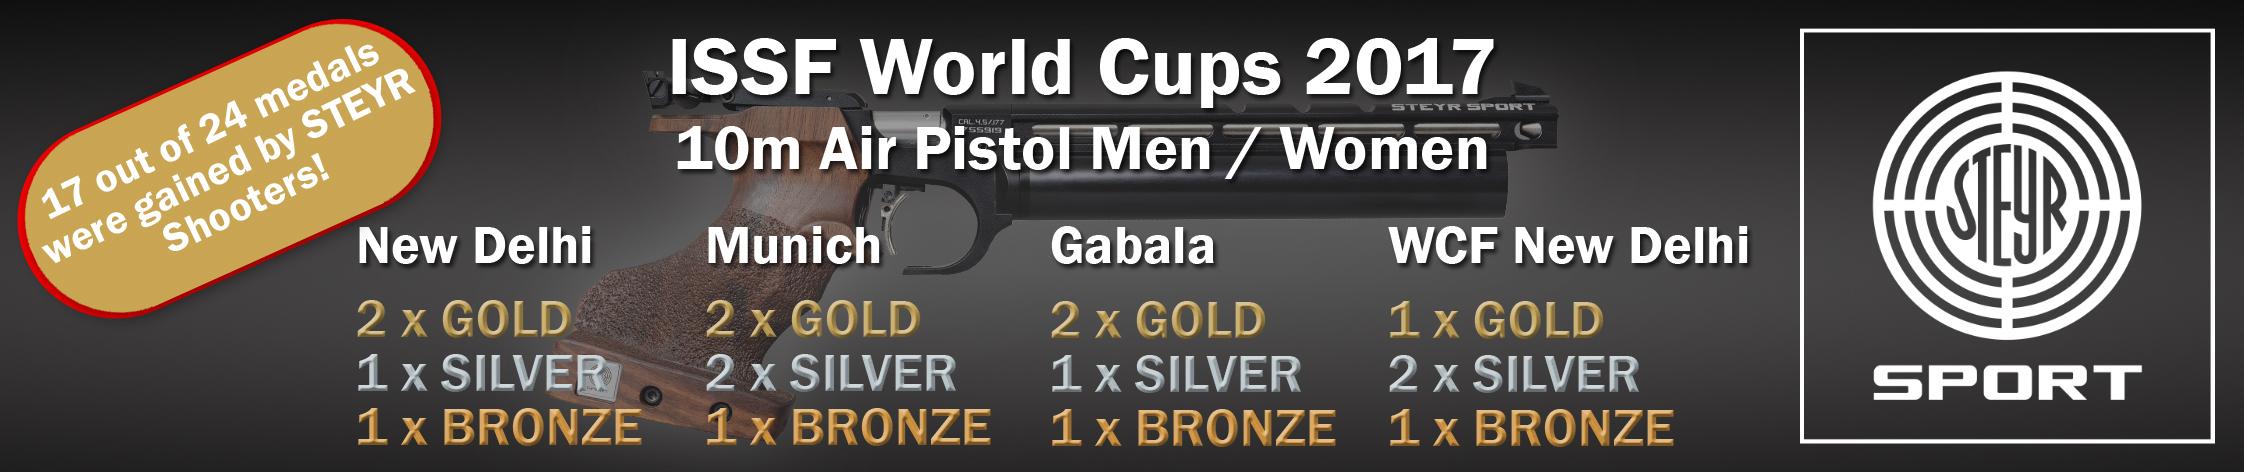 Sukcesy w Pucharach Swiata 2017